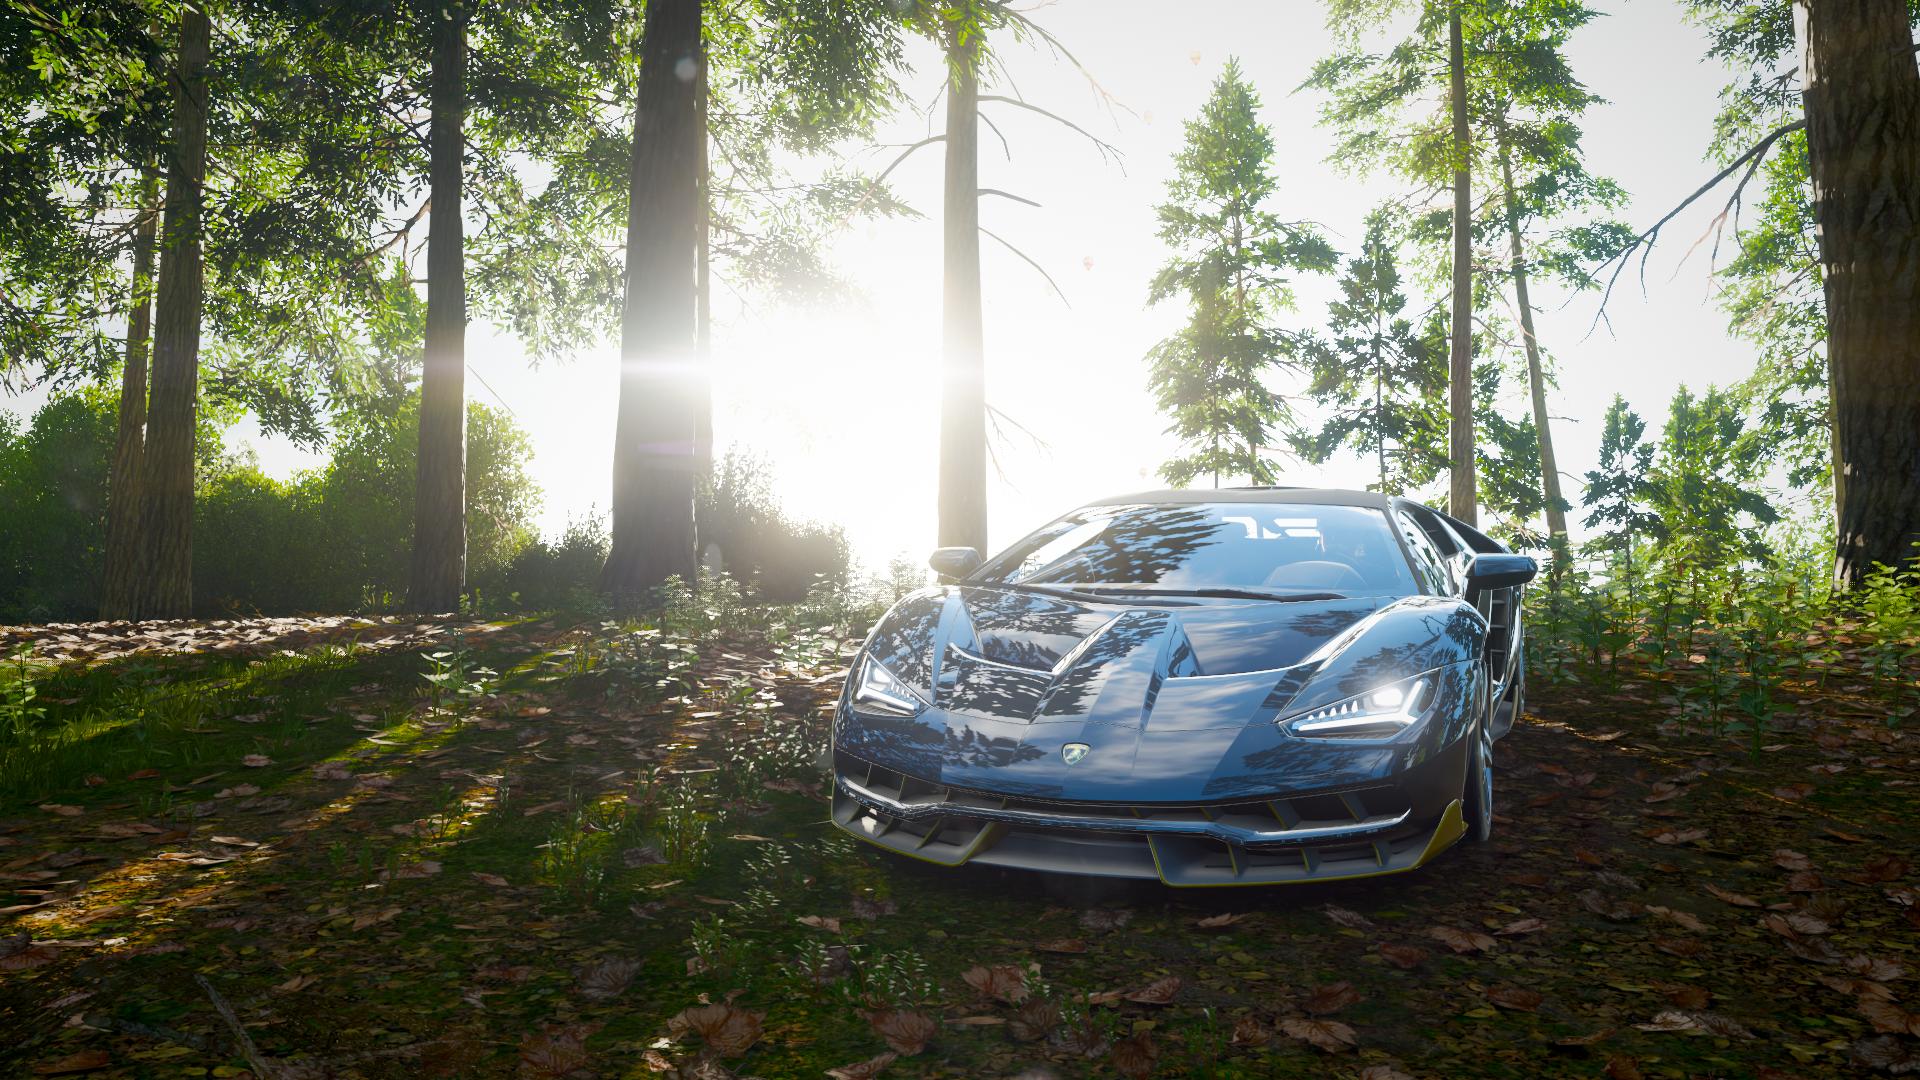 General 1920x1080 Xbox One Forza Horizon 4 car screen shot vehicle video games